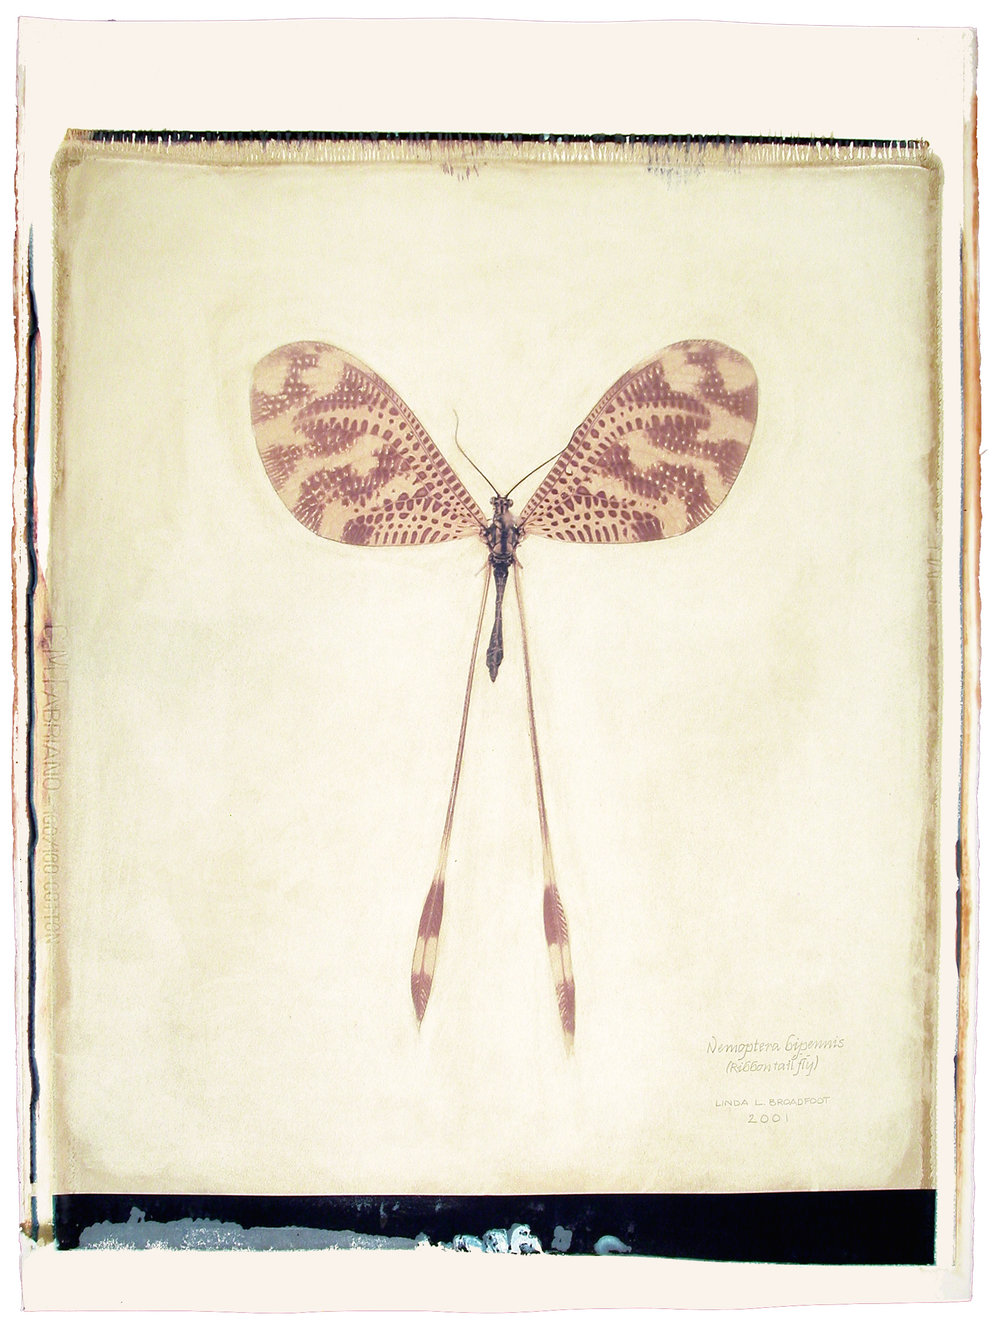 Nemoptera bipennis  (Ribbon Tail Fly), 2001